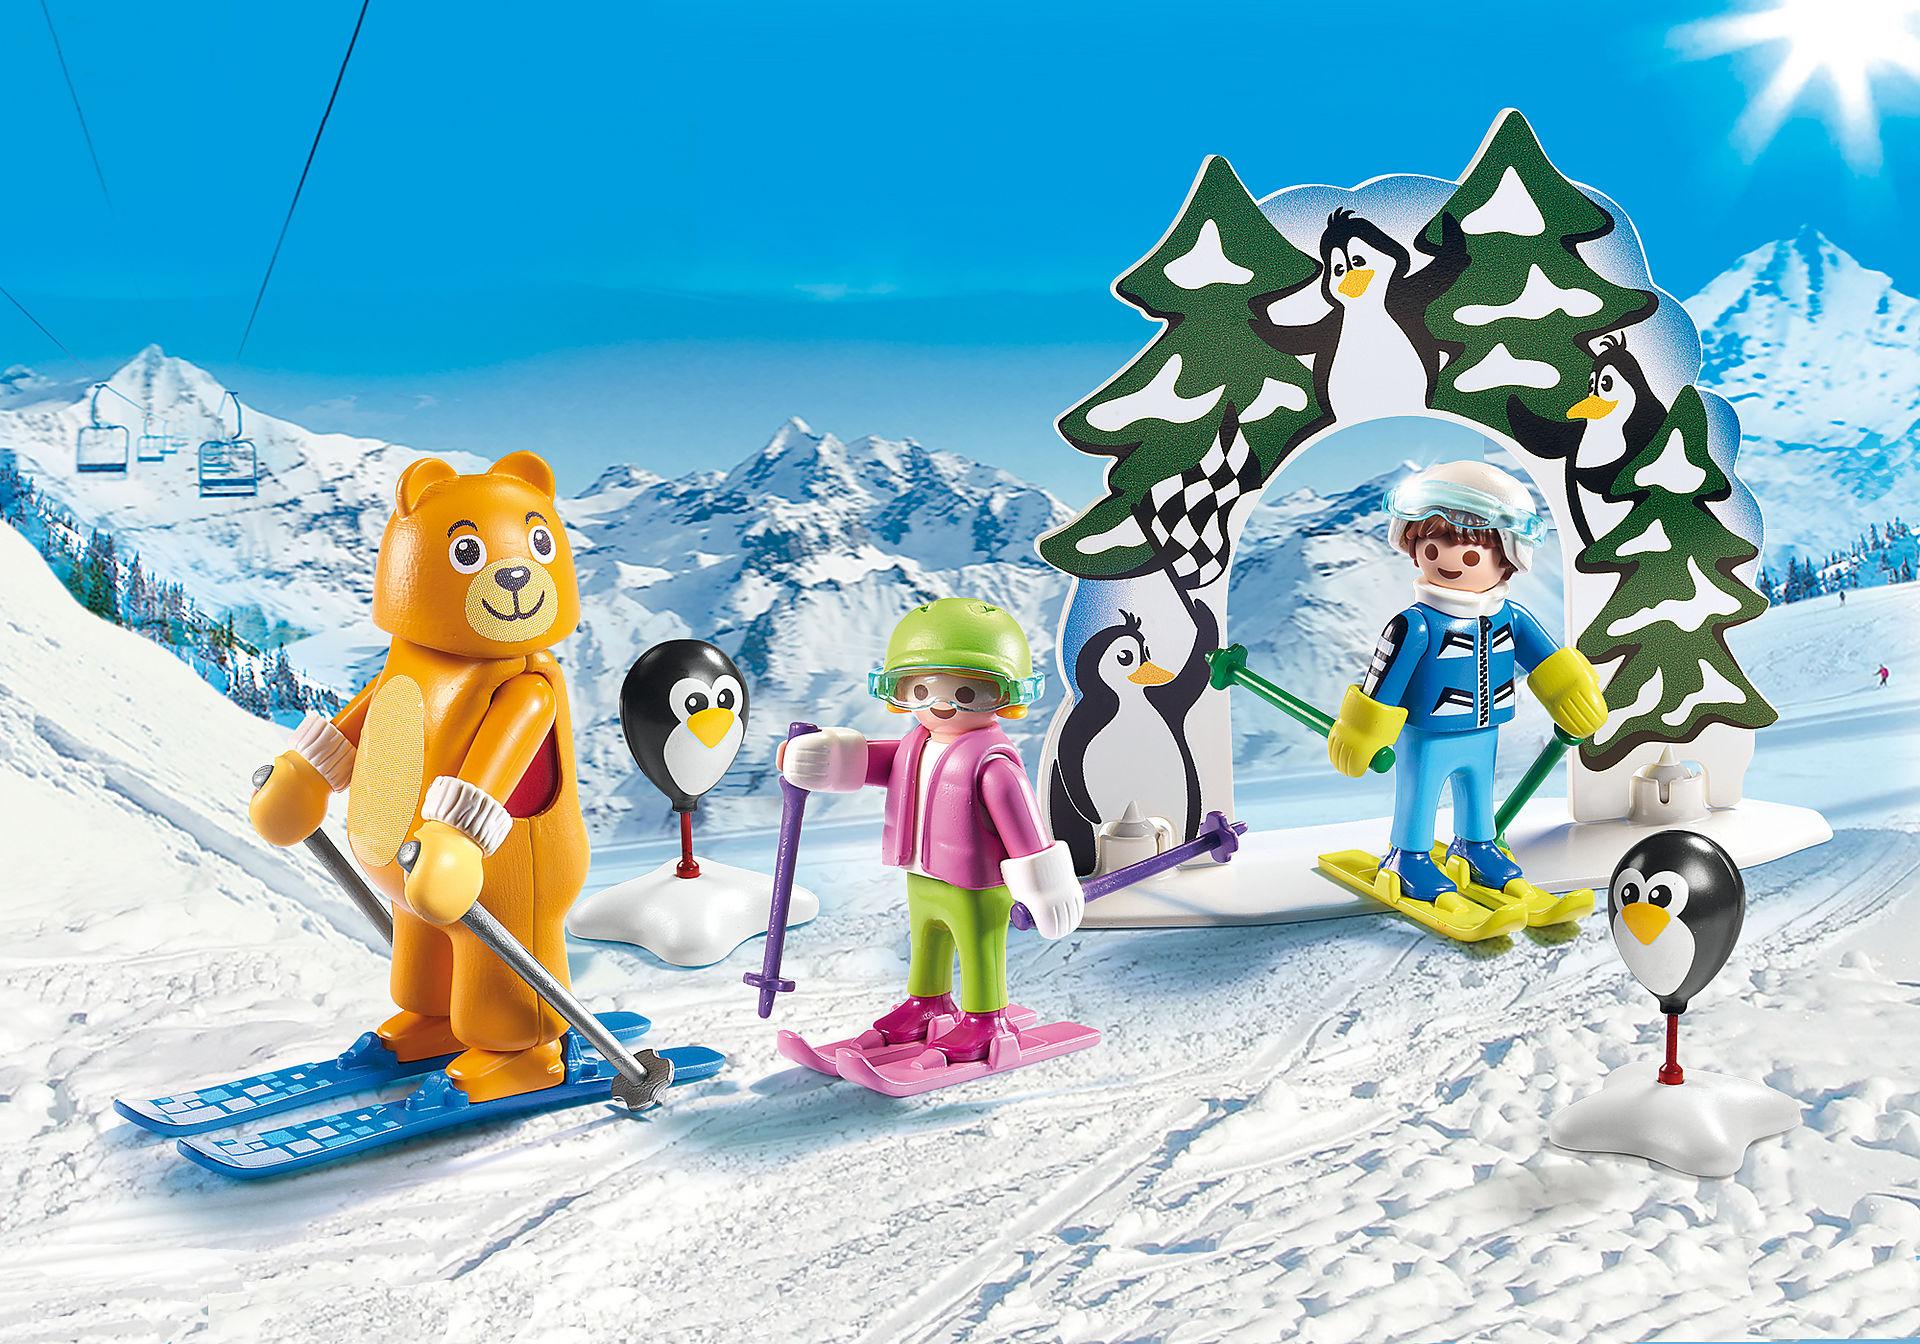 9282 Skischule zoom image1